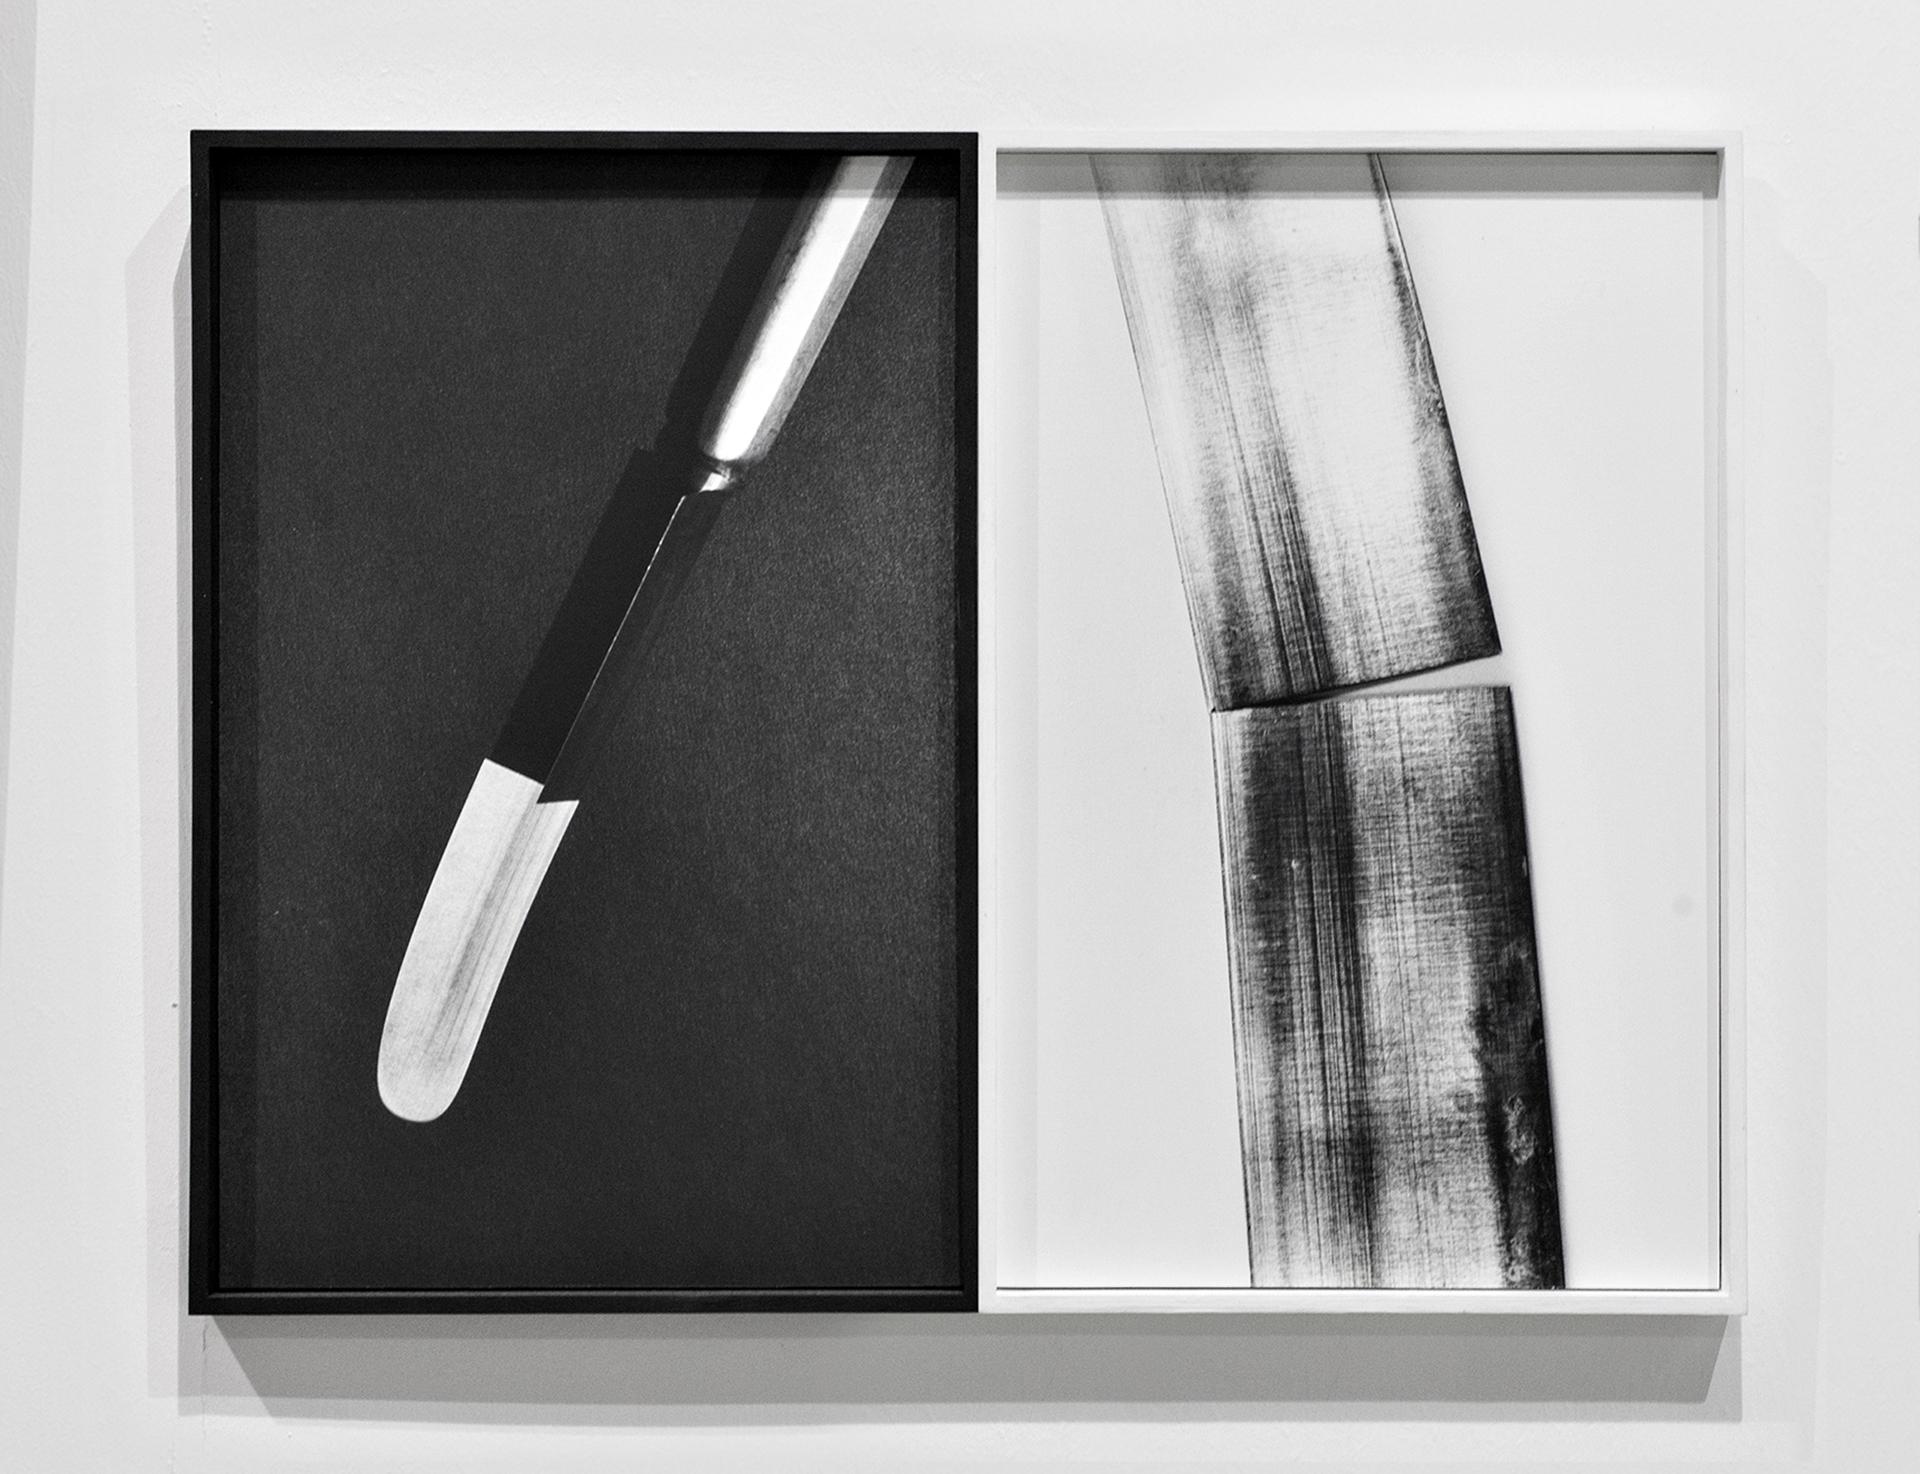 Filo, fotografía analógica impresión gelatina de plata en papel mate, enmarcada, 40 x 60cm, 2016.jpg